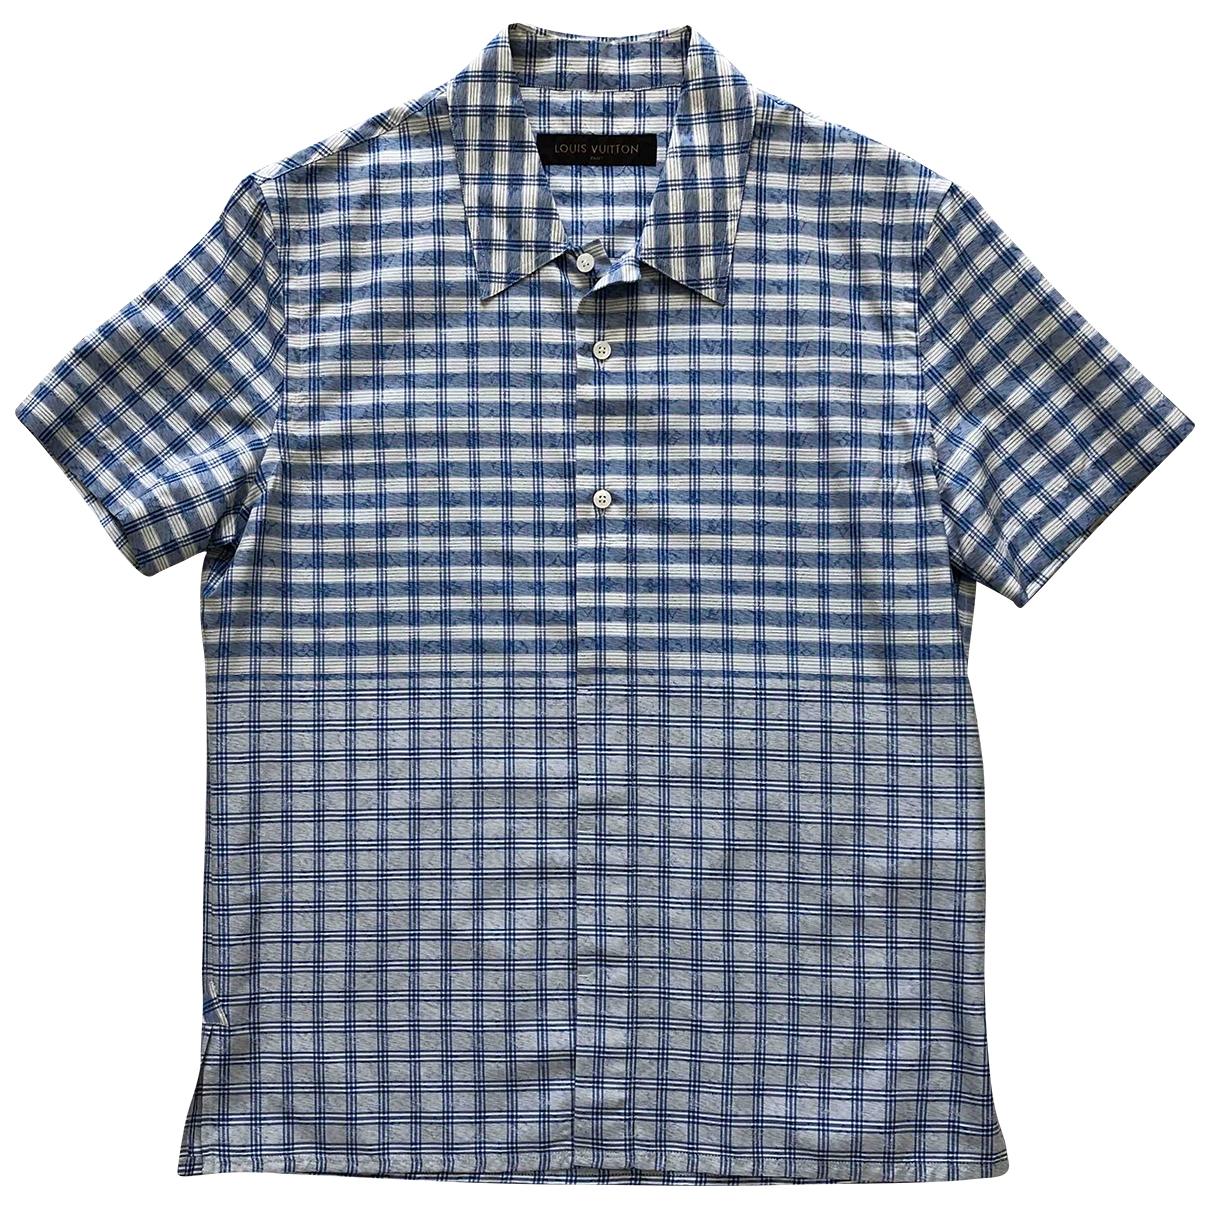 Camisas de Seda Louis Vuitton